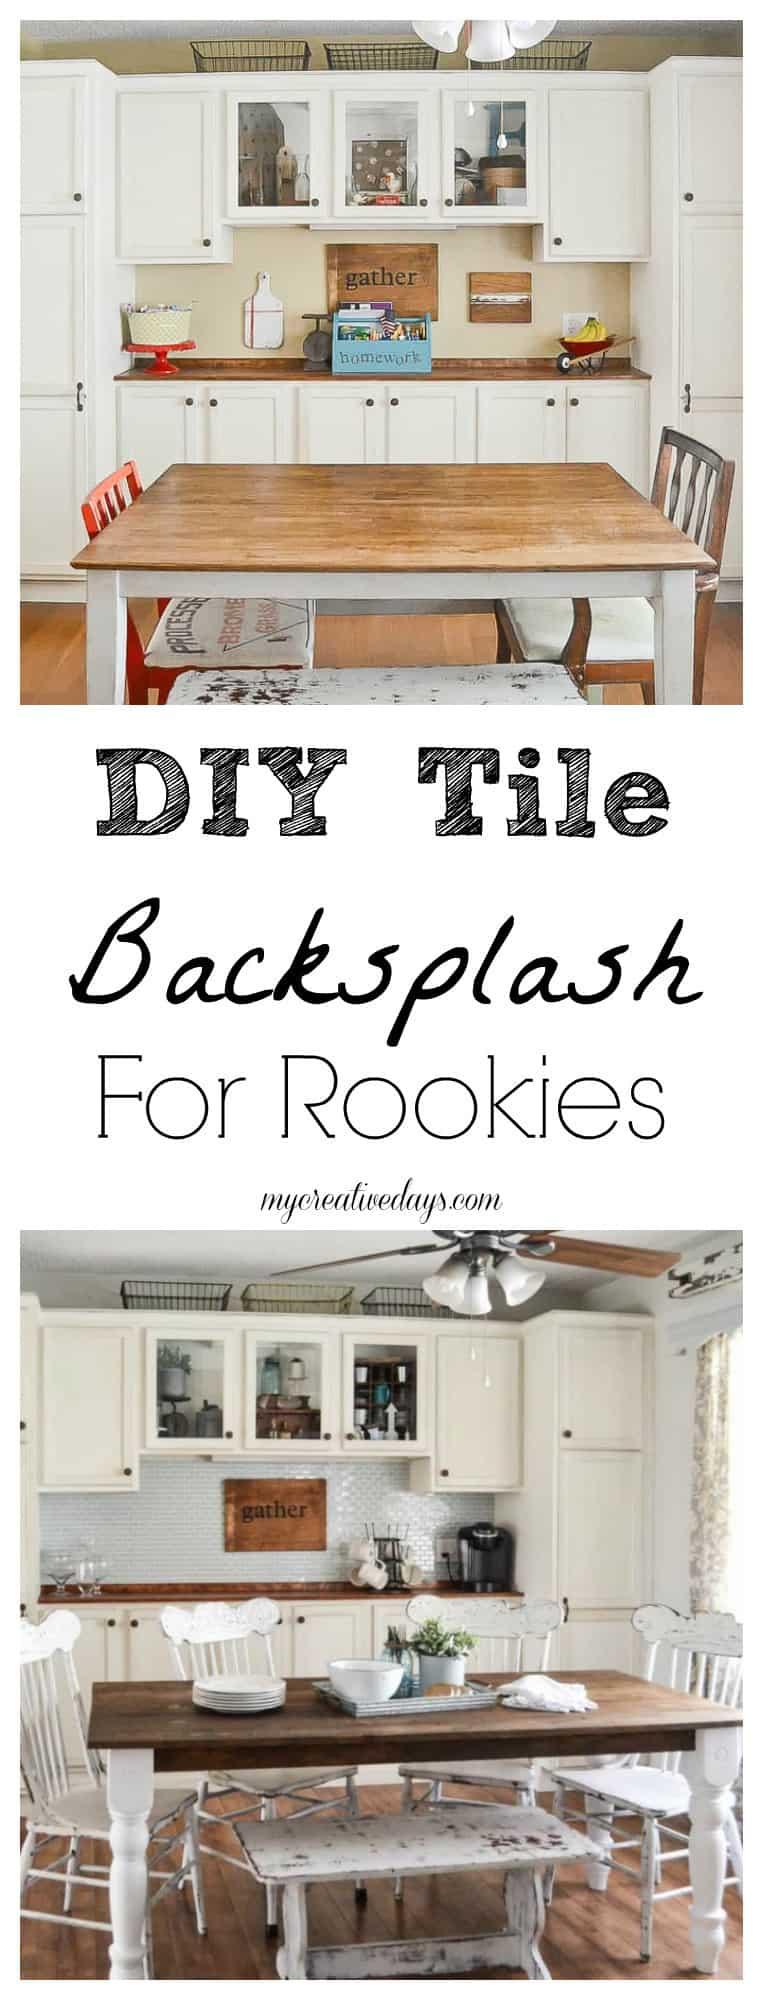 Diy Tile Backsplash For Rookies My Creative Days